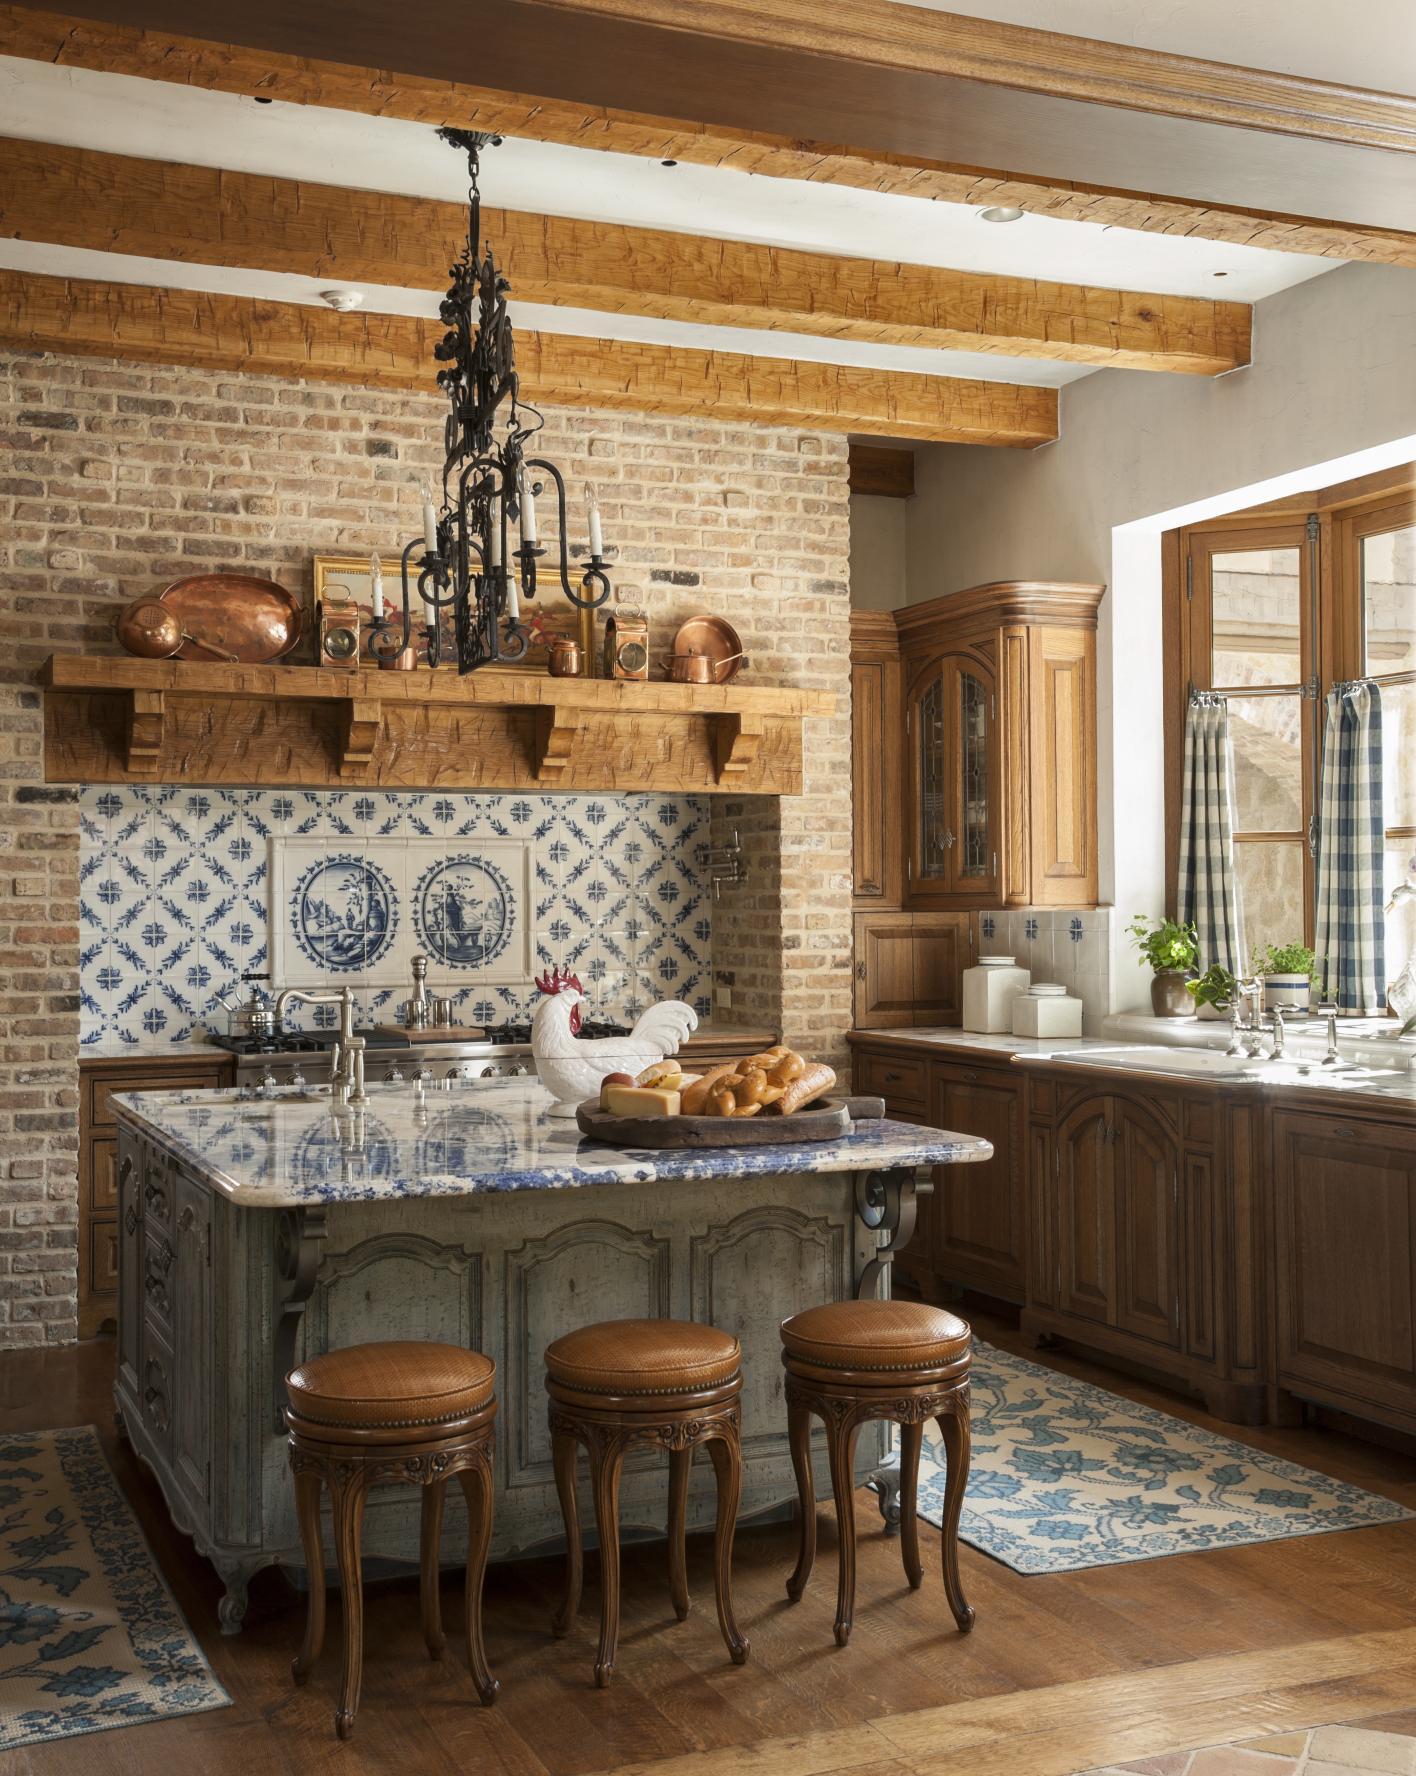 Classic, inexpensive kitchen island